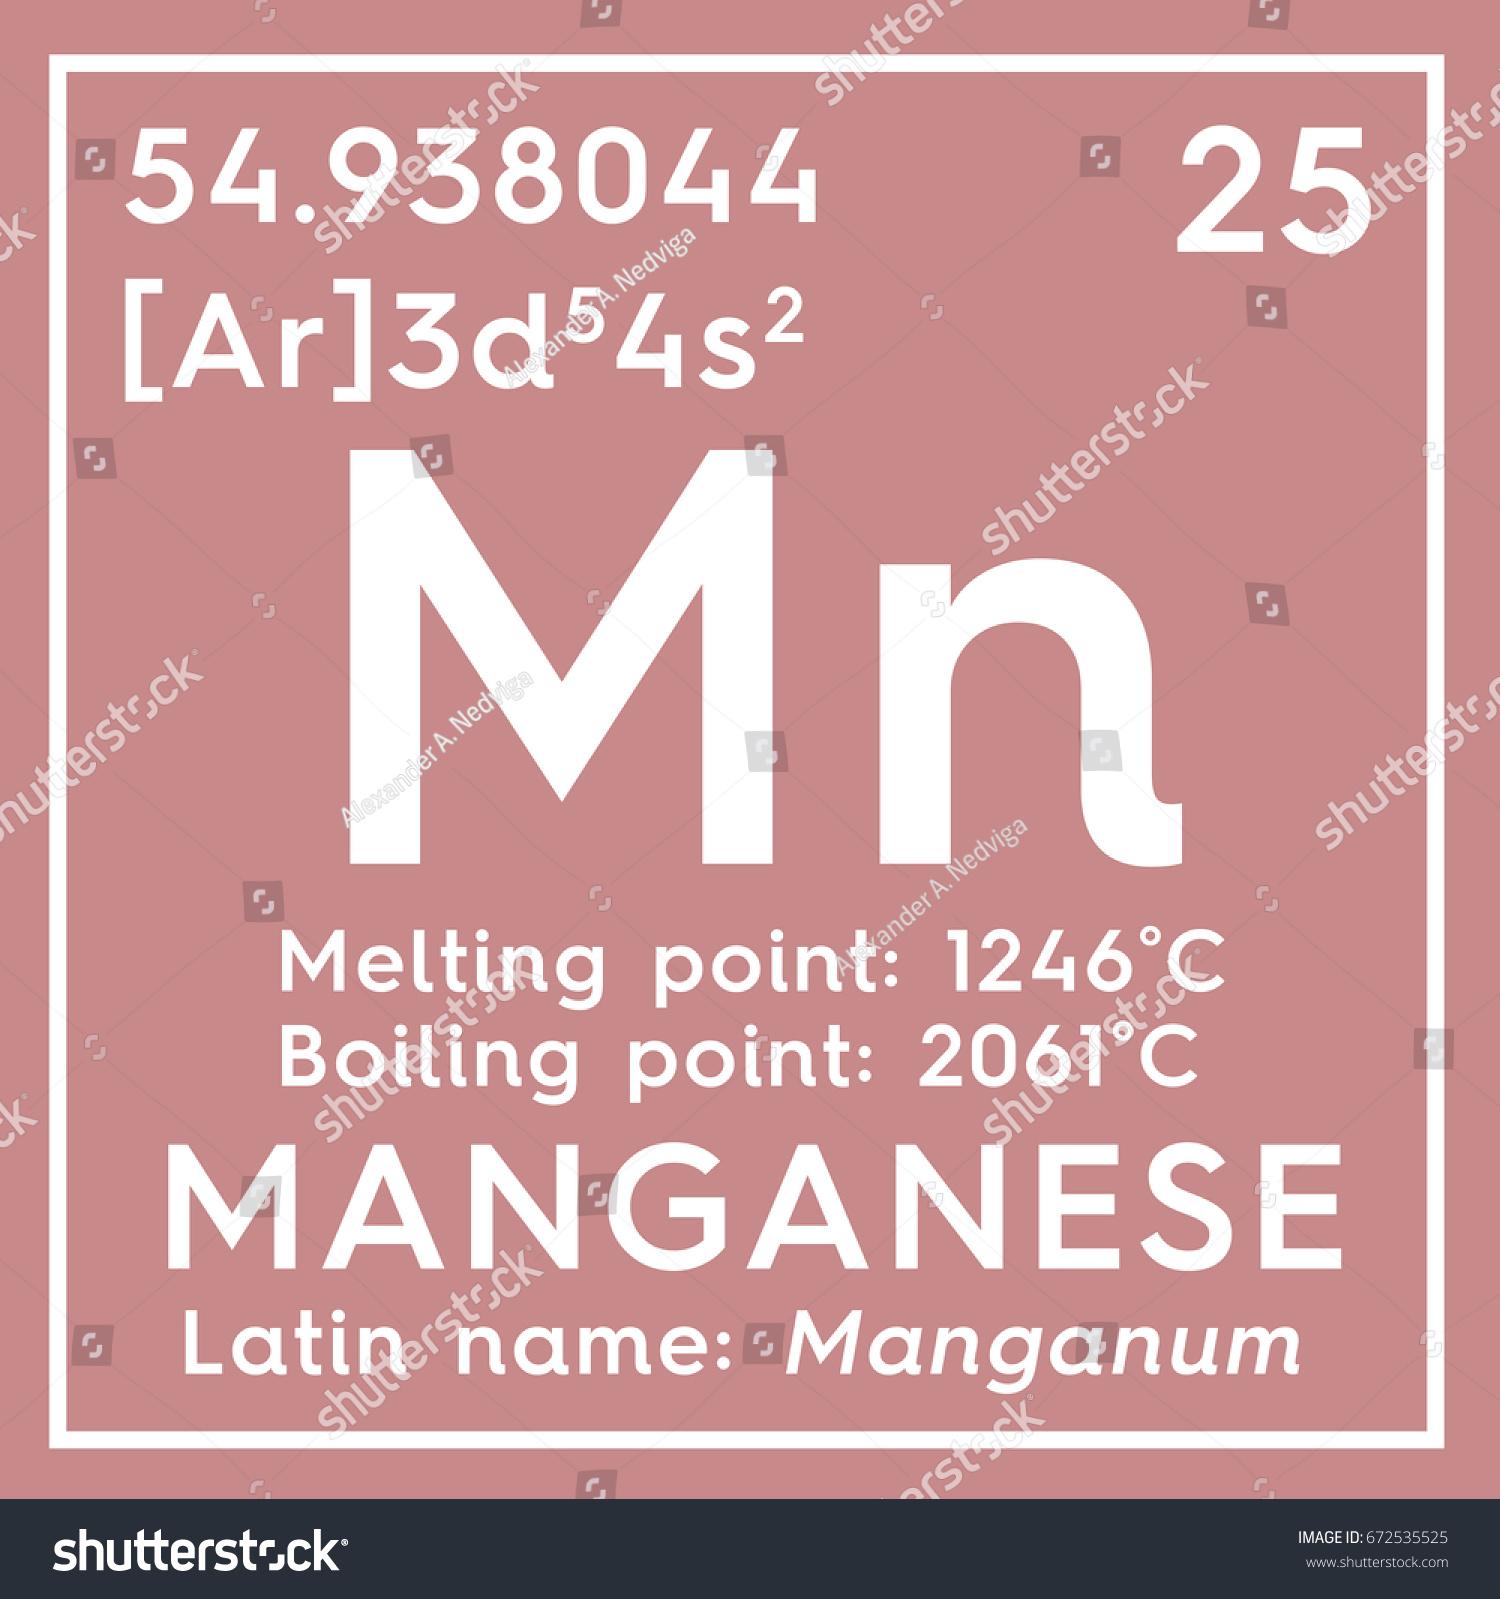 Manganese manganum transition metals chemical element stock manganese manganum transition metals chemical element of mendeleevs periodic table manganese in gamestrikefo Images